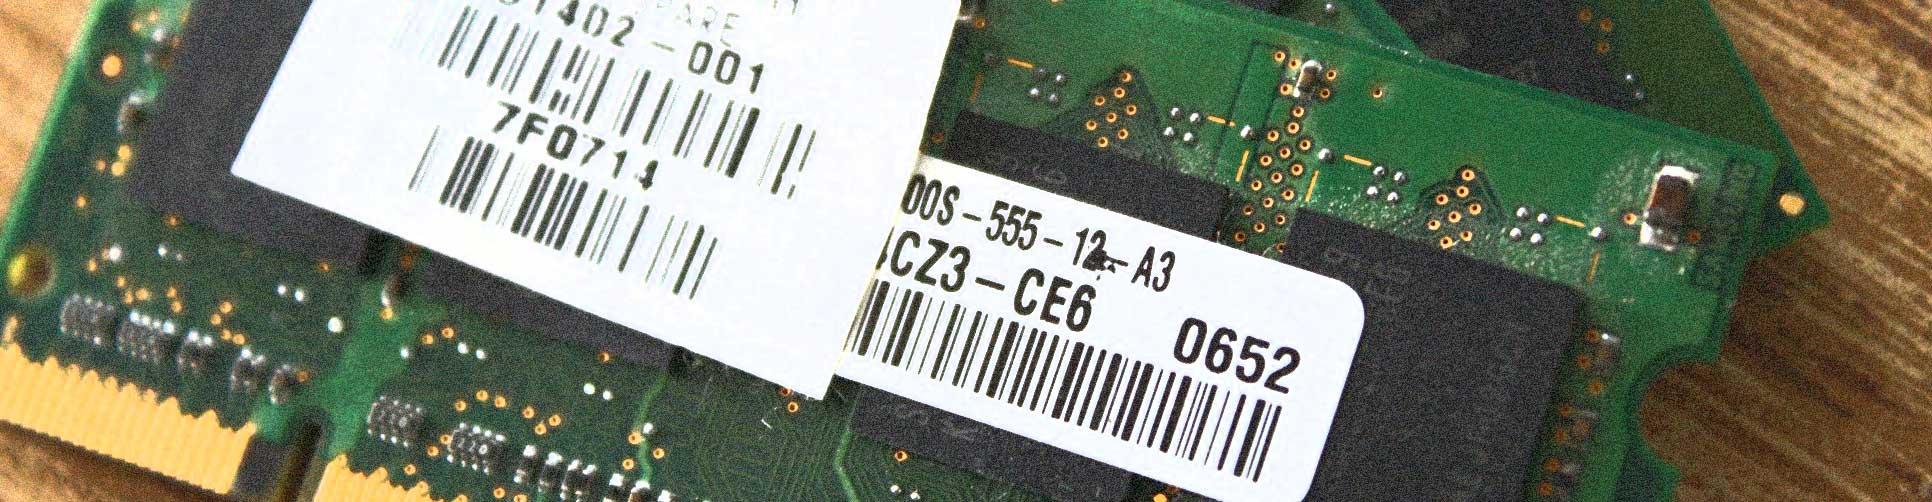 venta-de hardware-puerto-vallarta